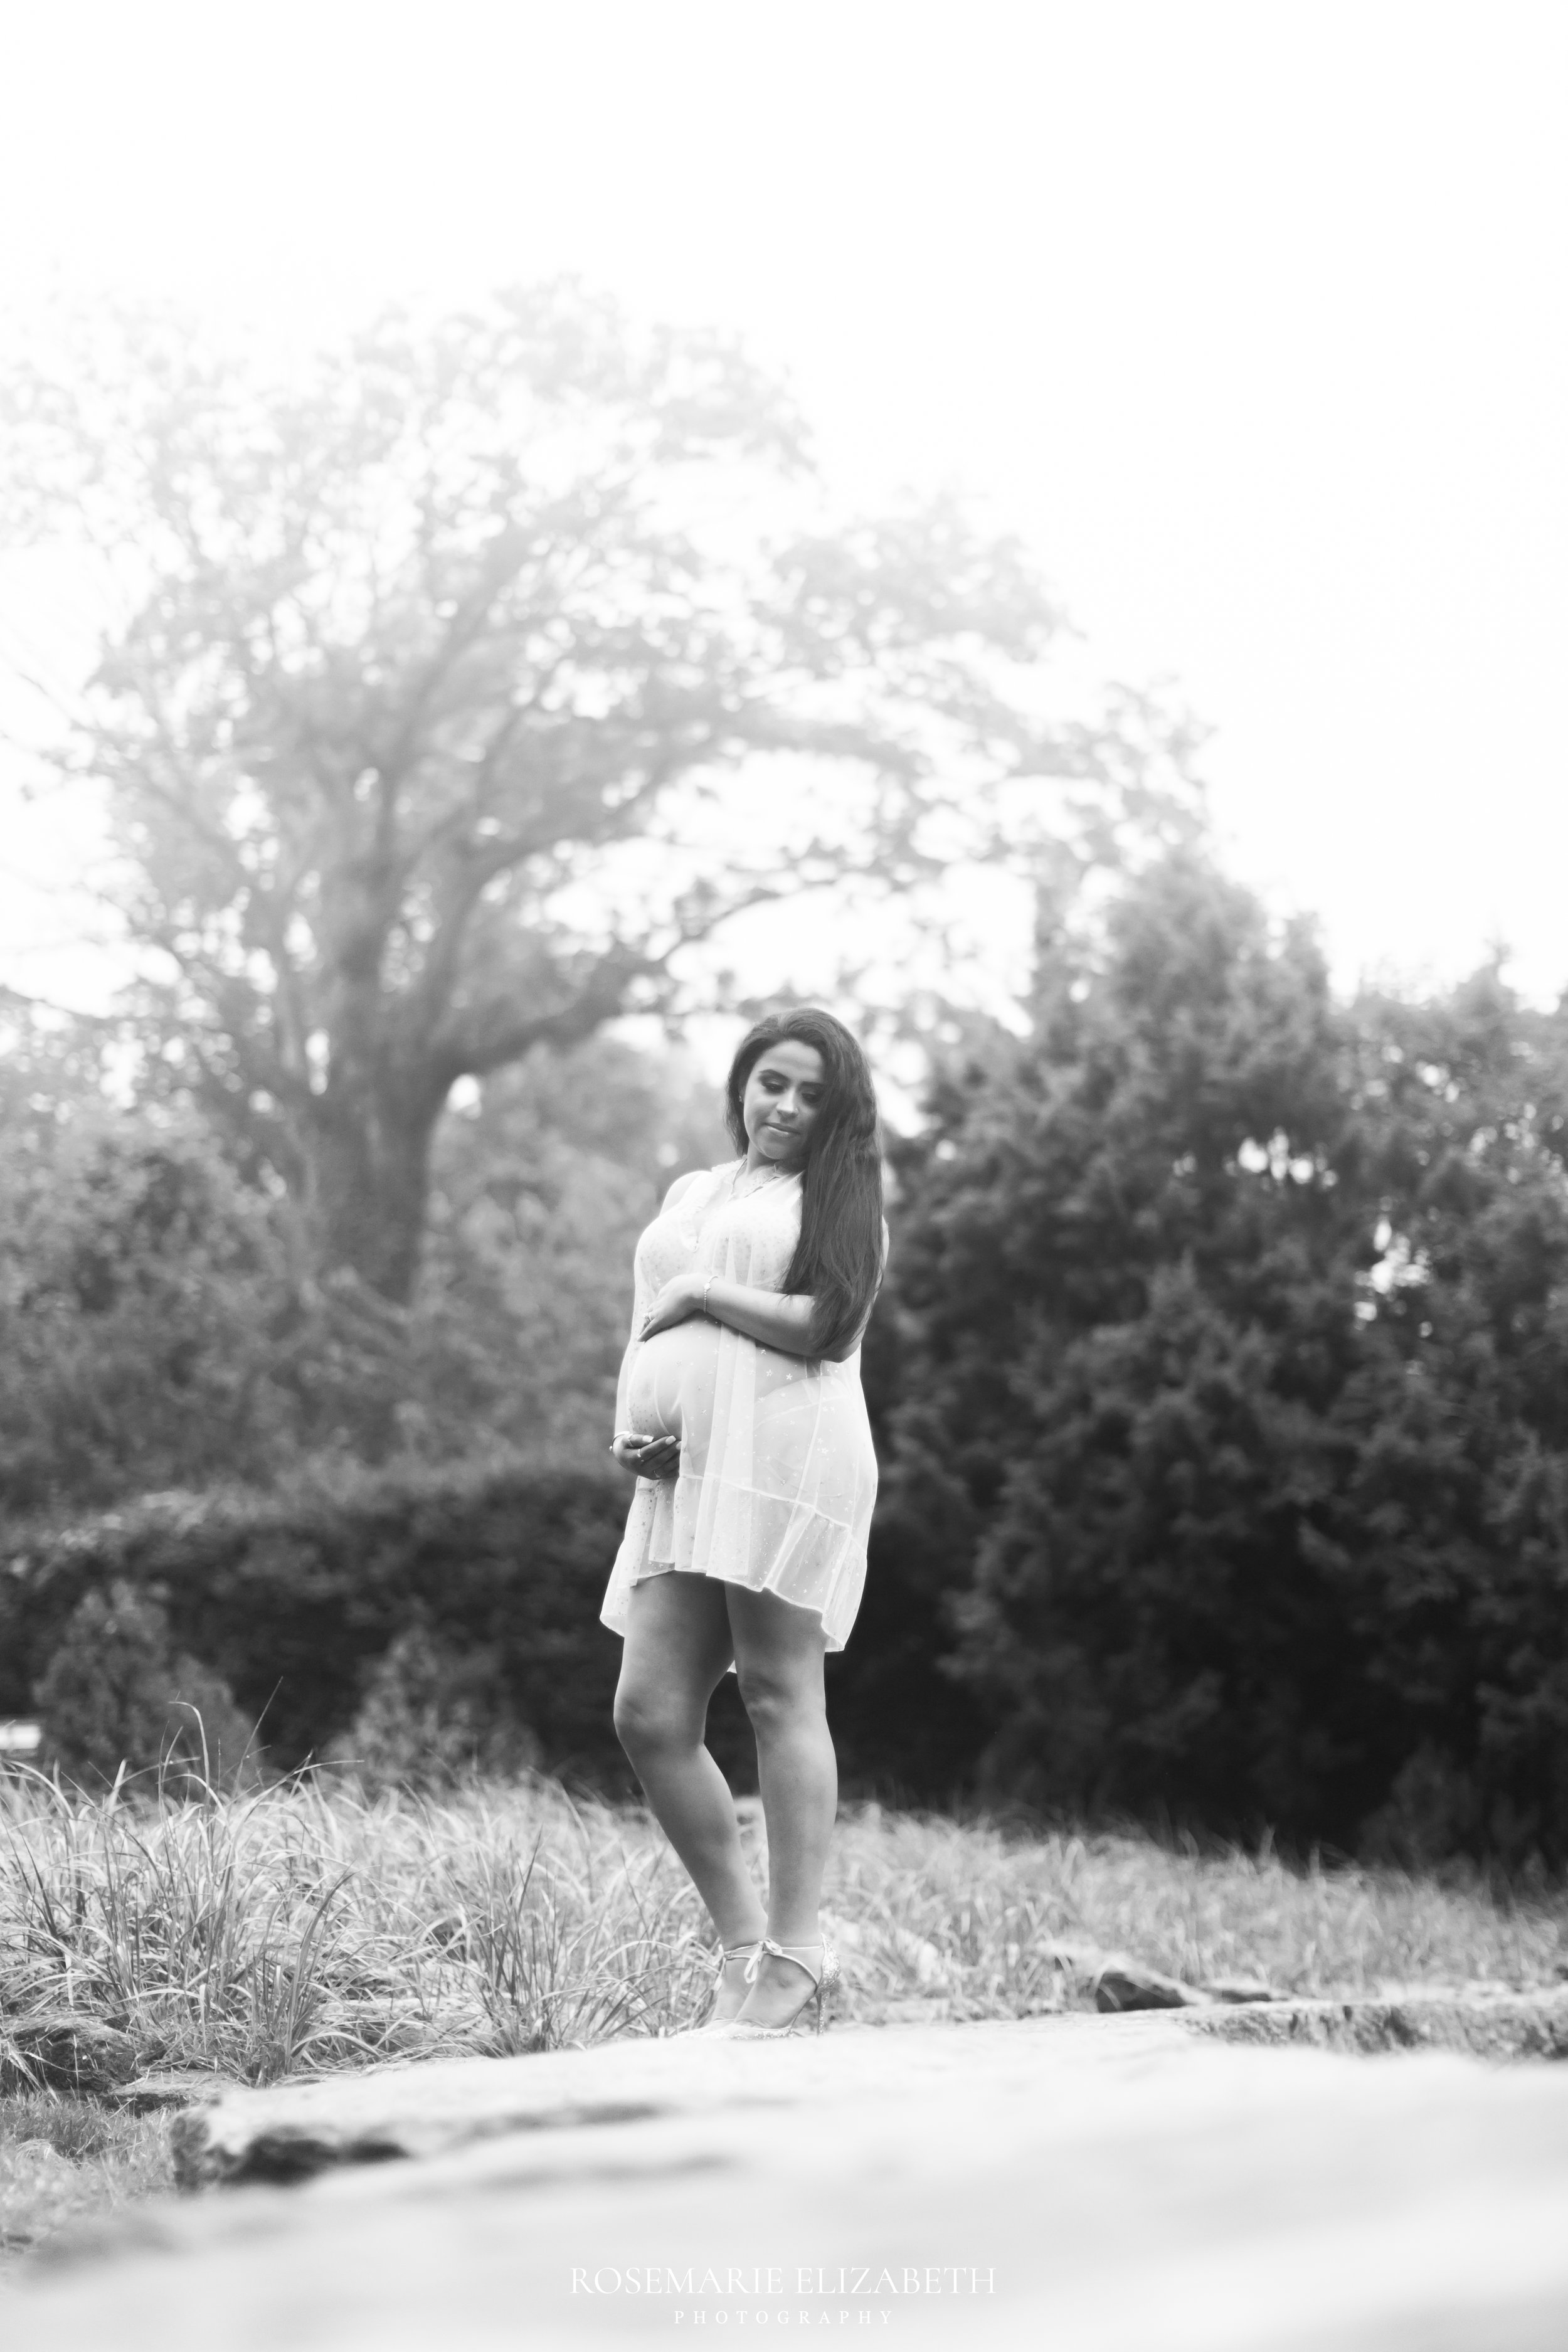 RosemarieElizabethPhotography-3508.jpg